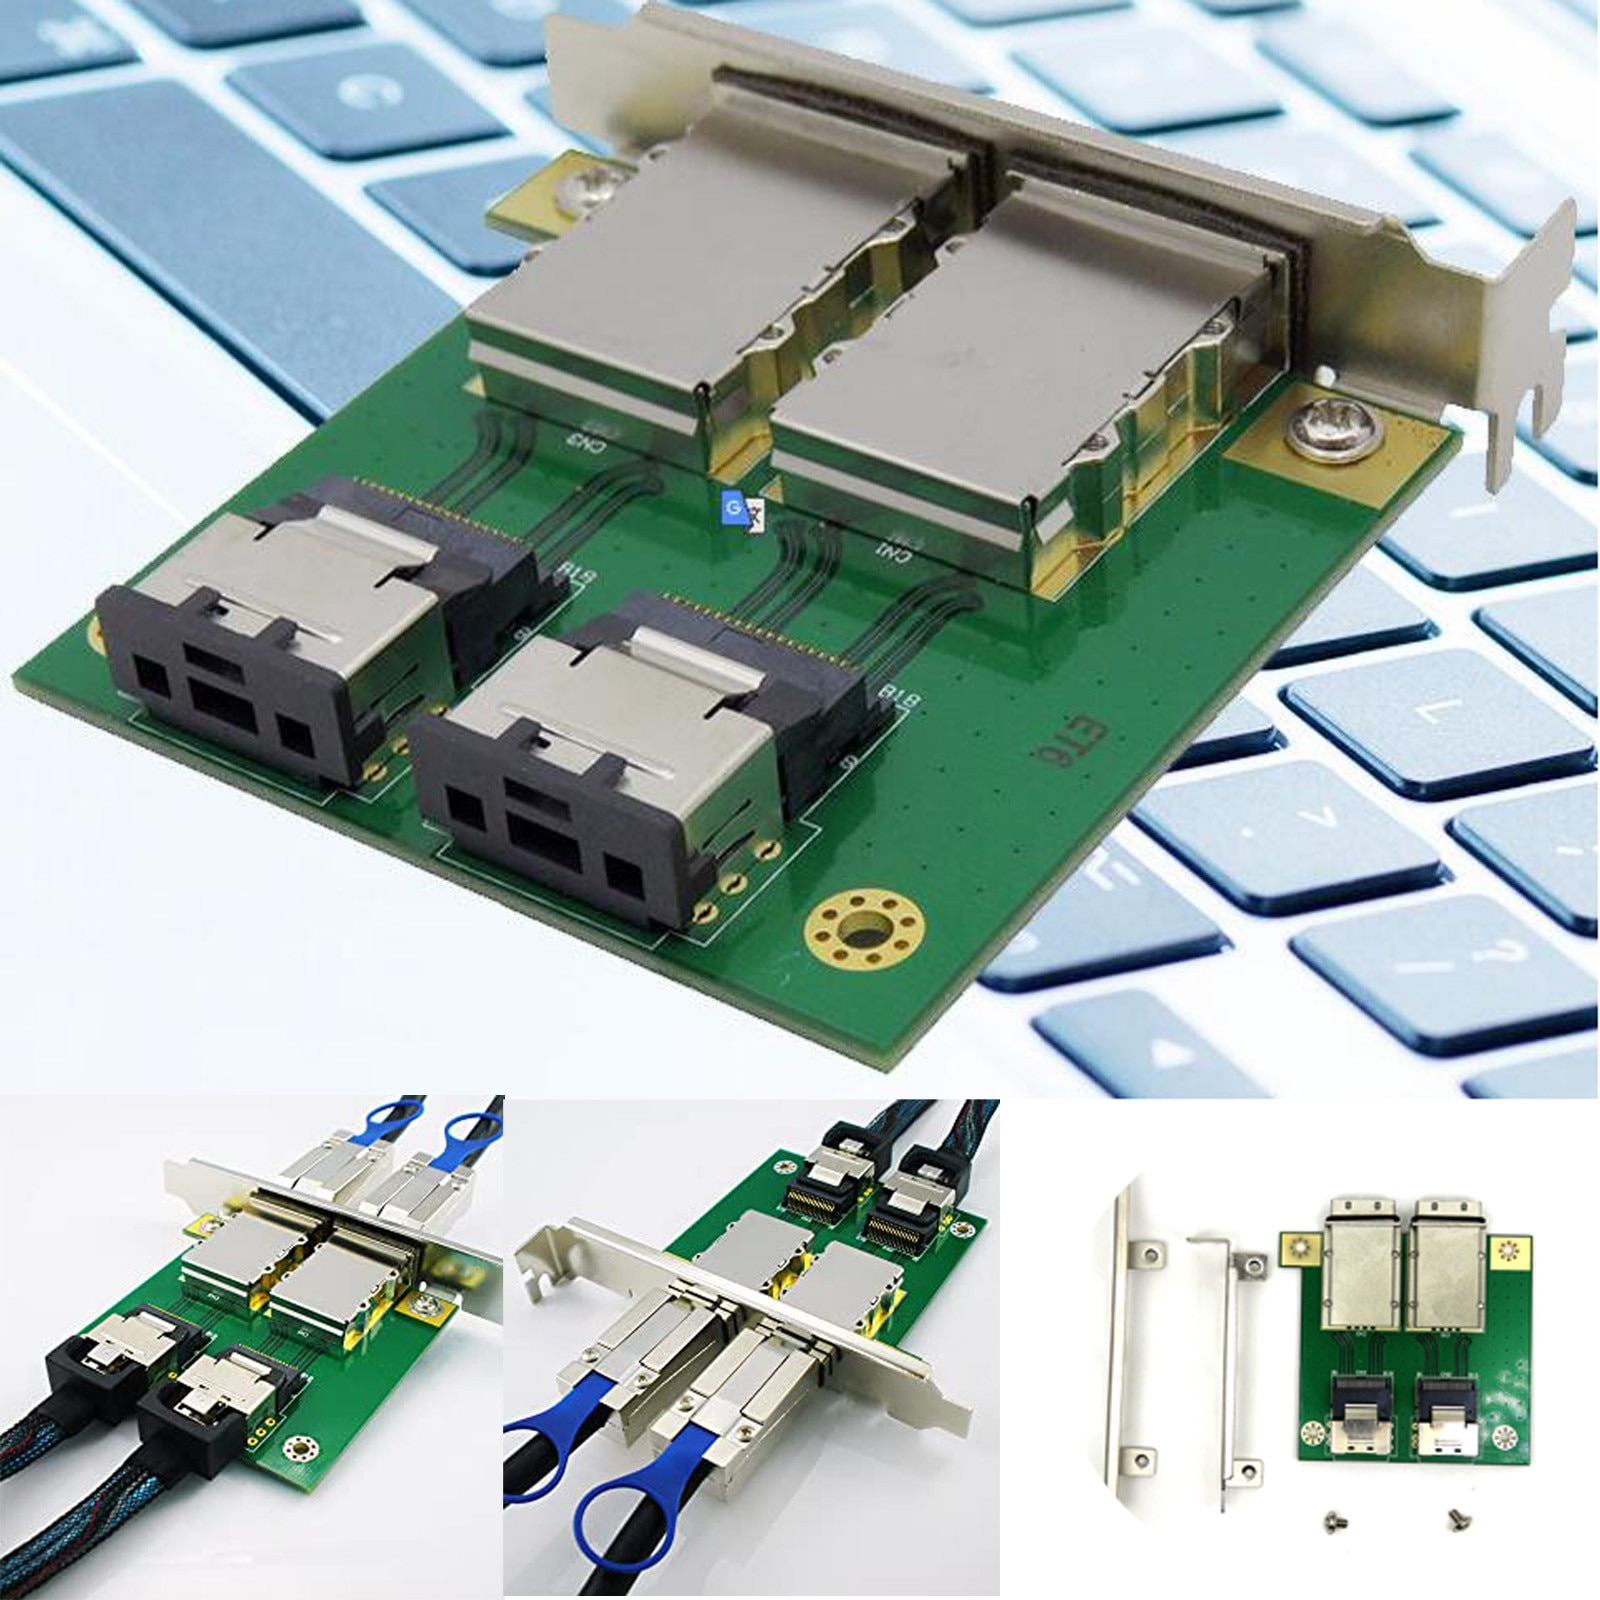 2 portas mini sas para interno SFF-8087 para externo 8088 pci-mini sas-26p adaptador raid cabo painel frontal pci sas cartão